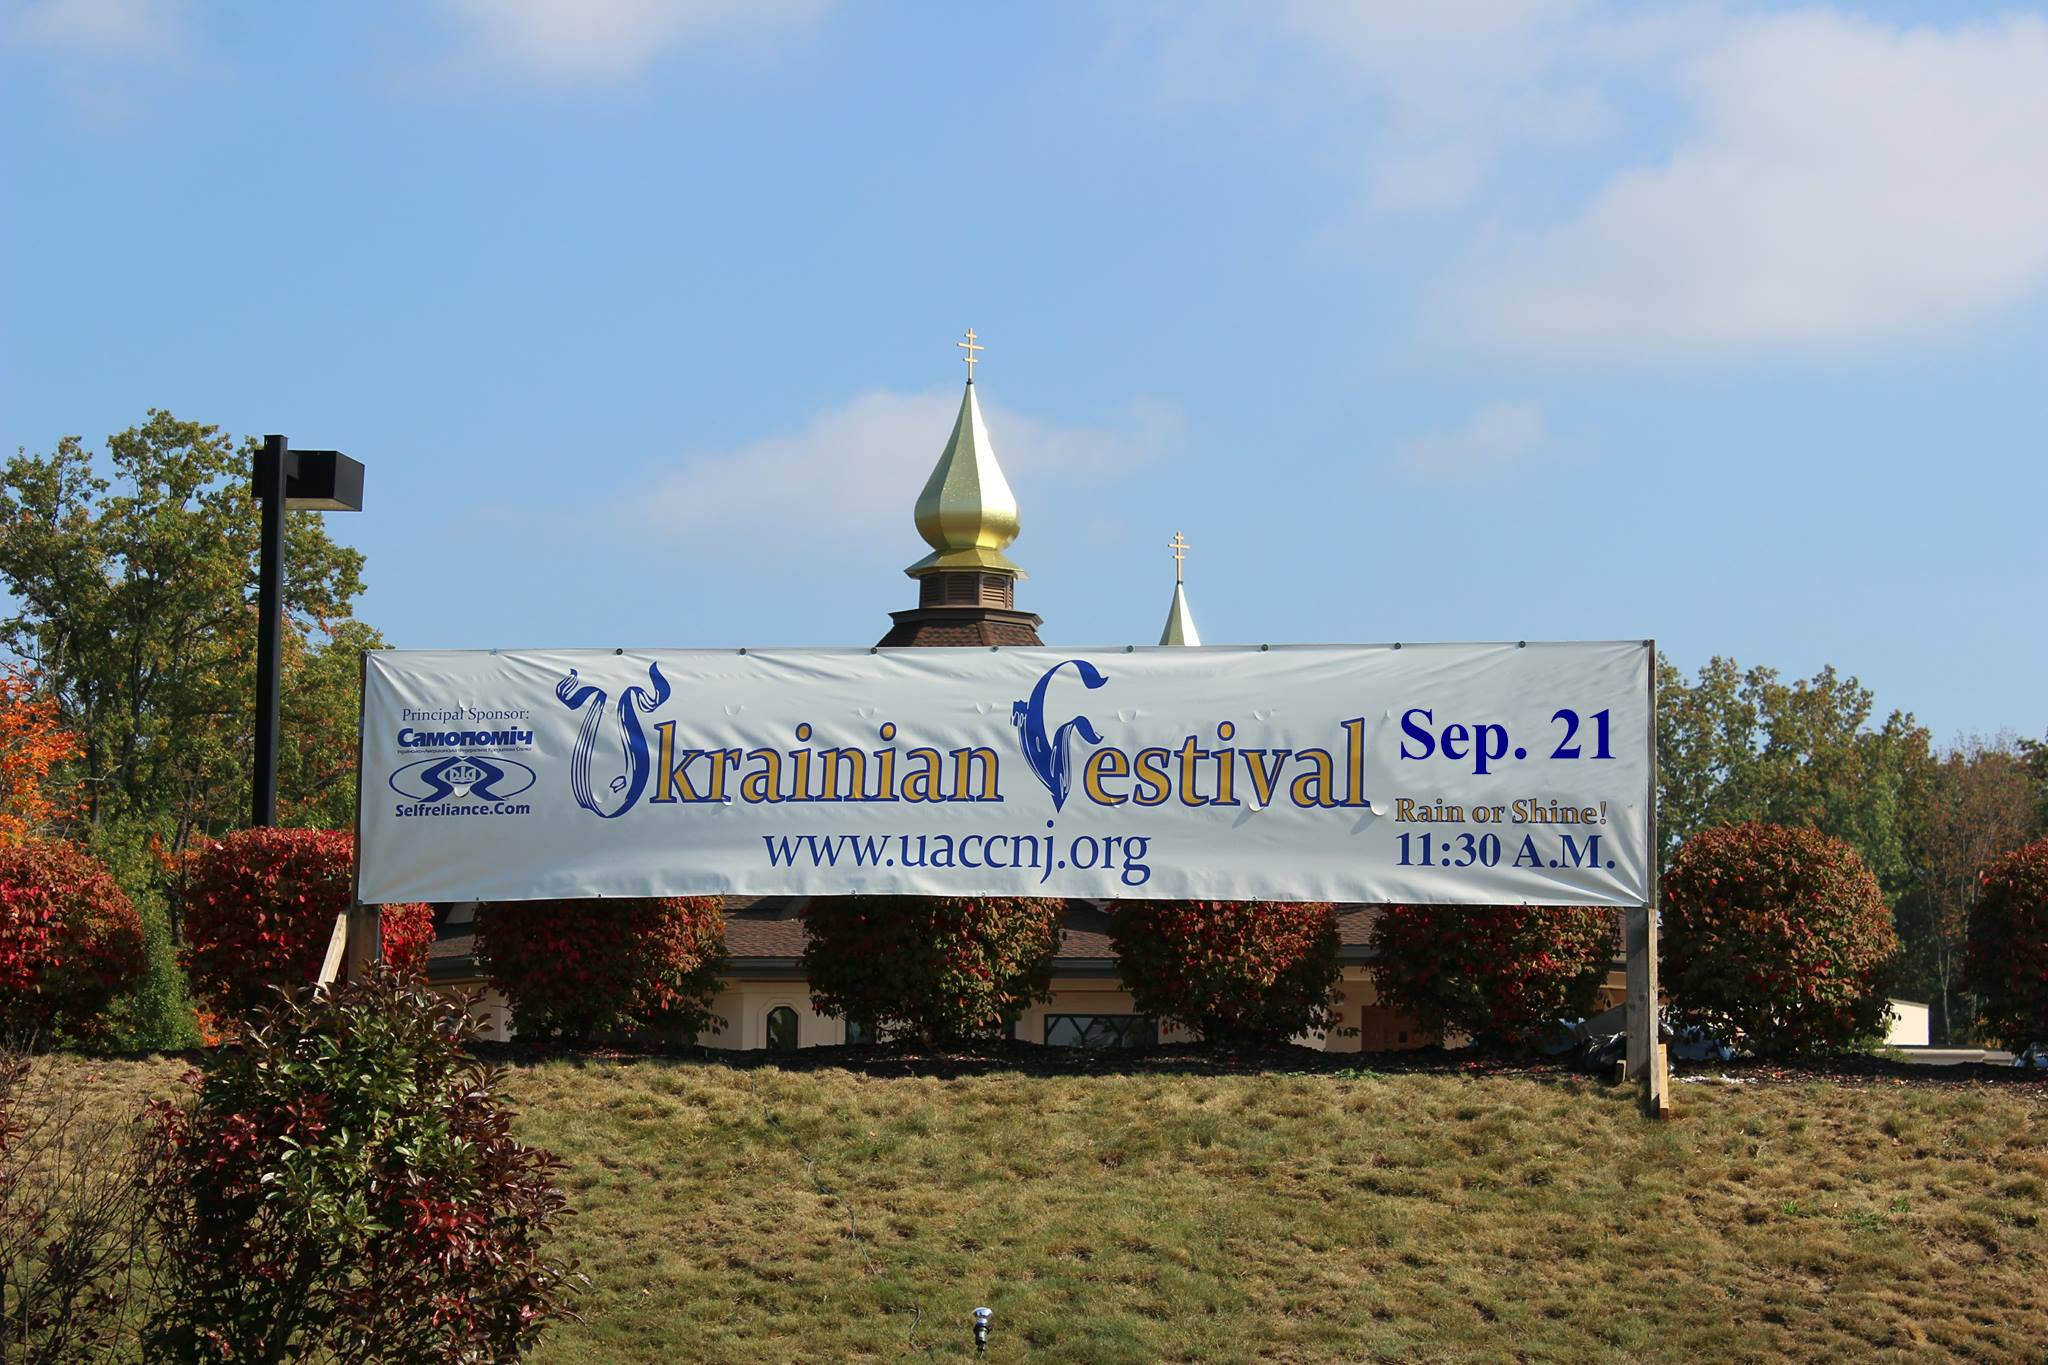 Annual Ukrainian Festival Annual Ukrainian Festival